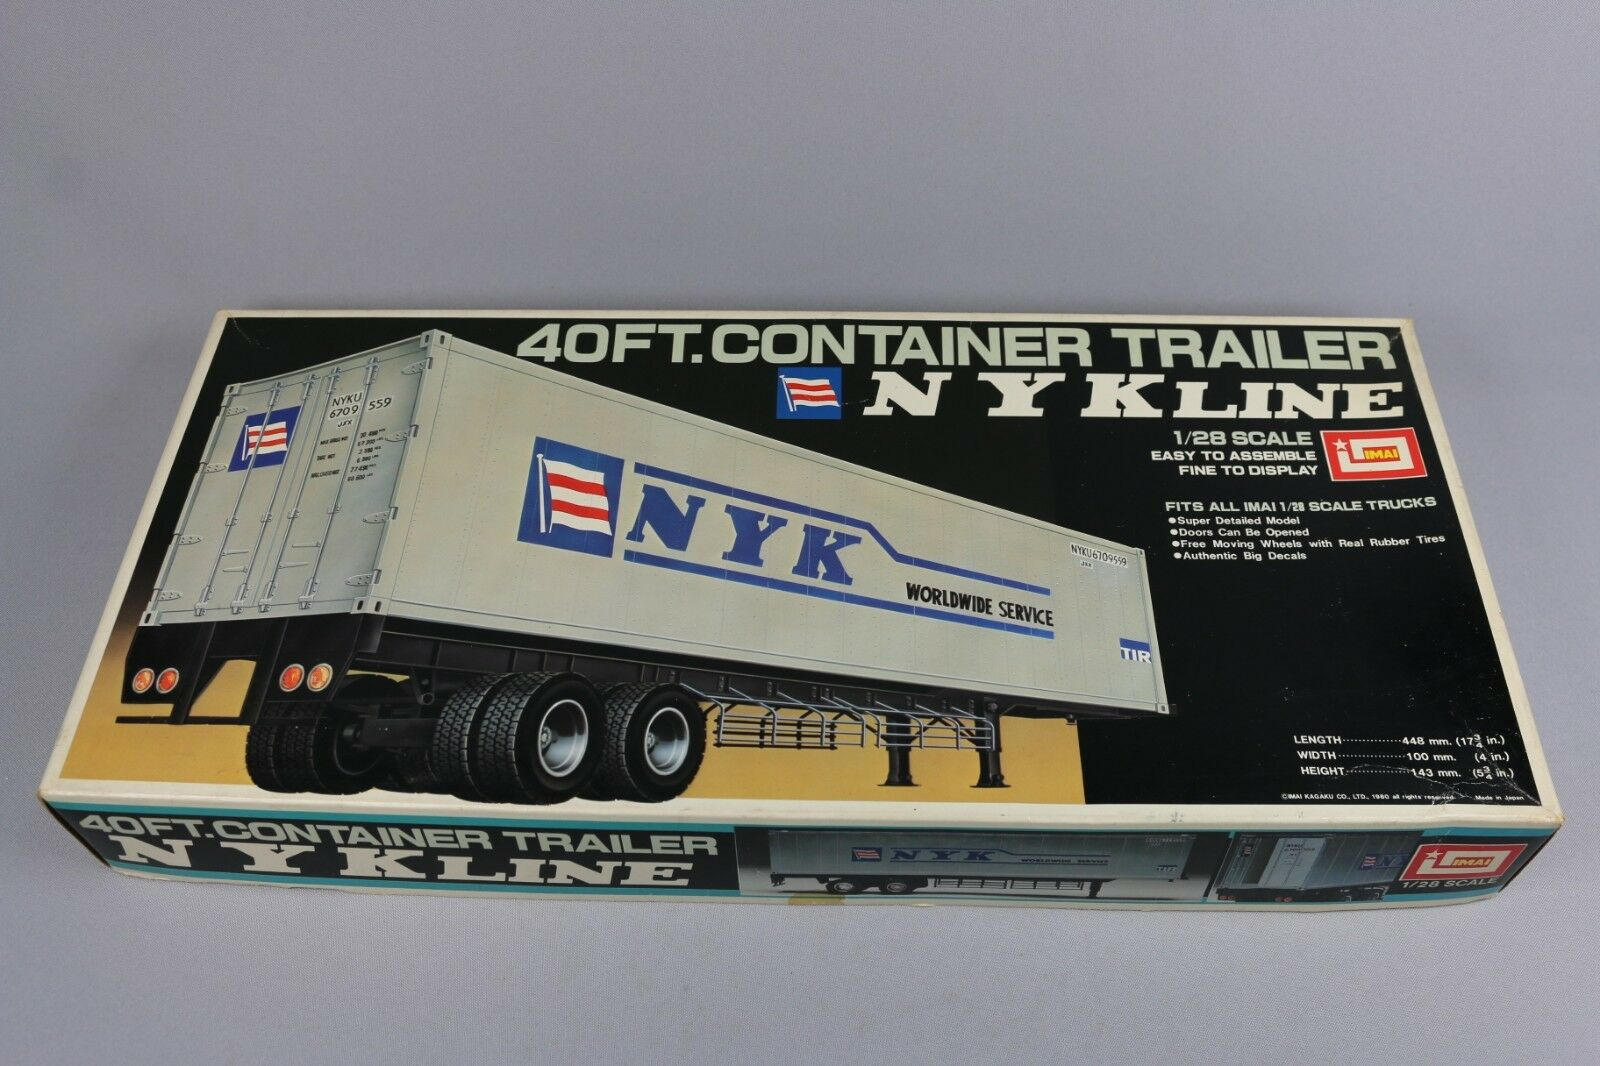 Zf1361 Imai 1 28 modellolo Truck B-995 40ft. Container Trailer Nyk mondowide